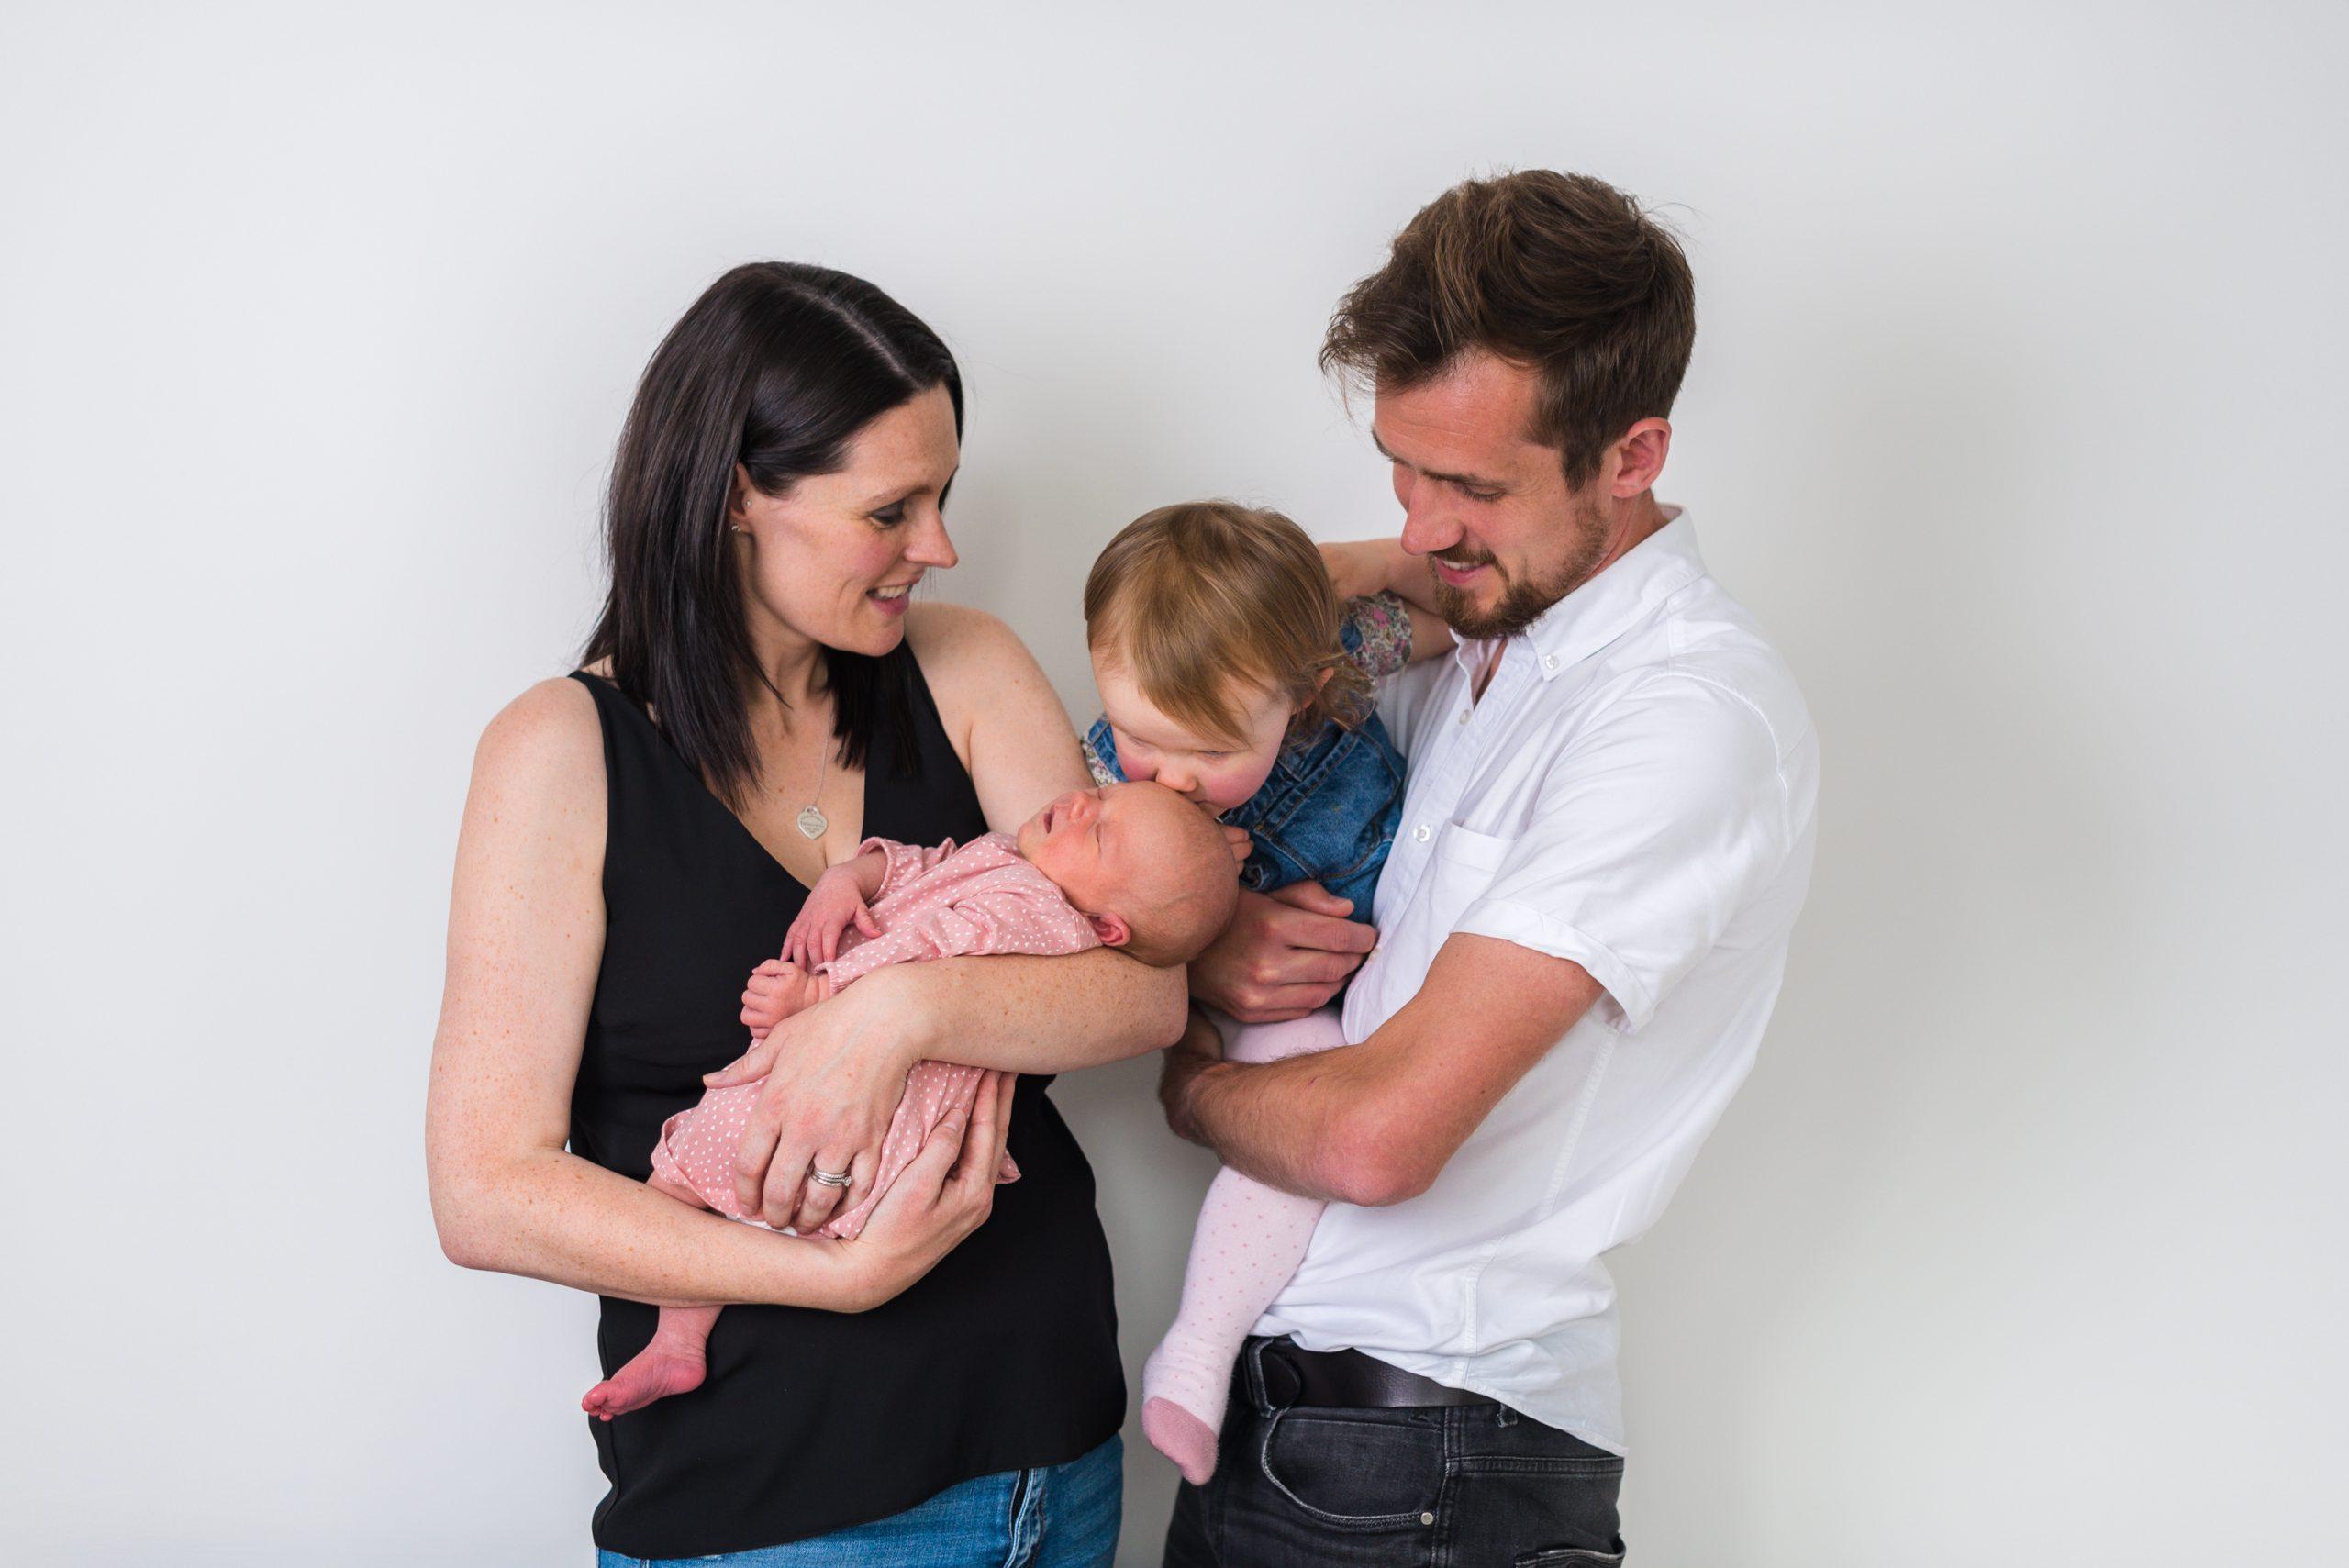 Kane Family at Home Newborn Session